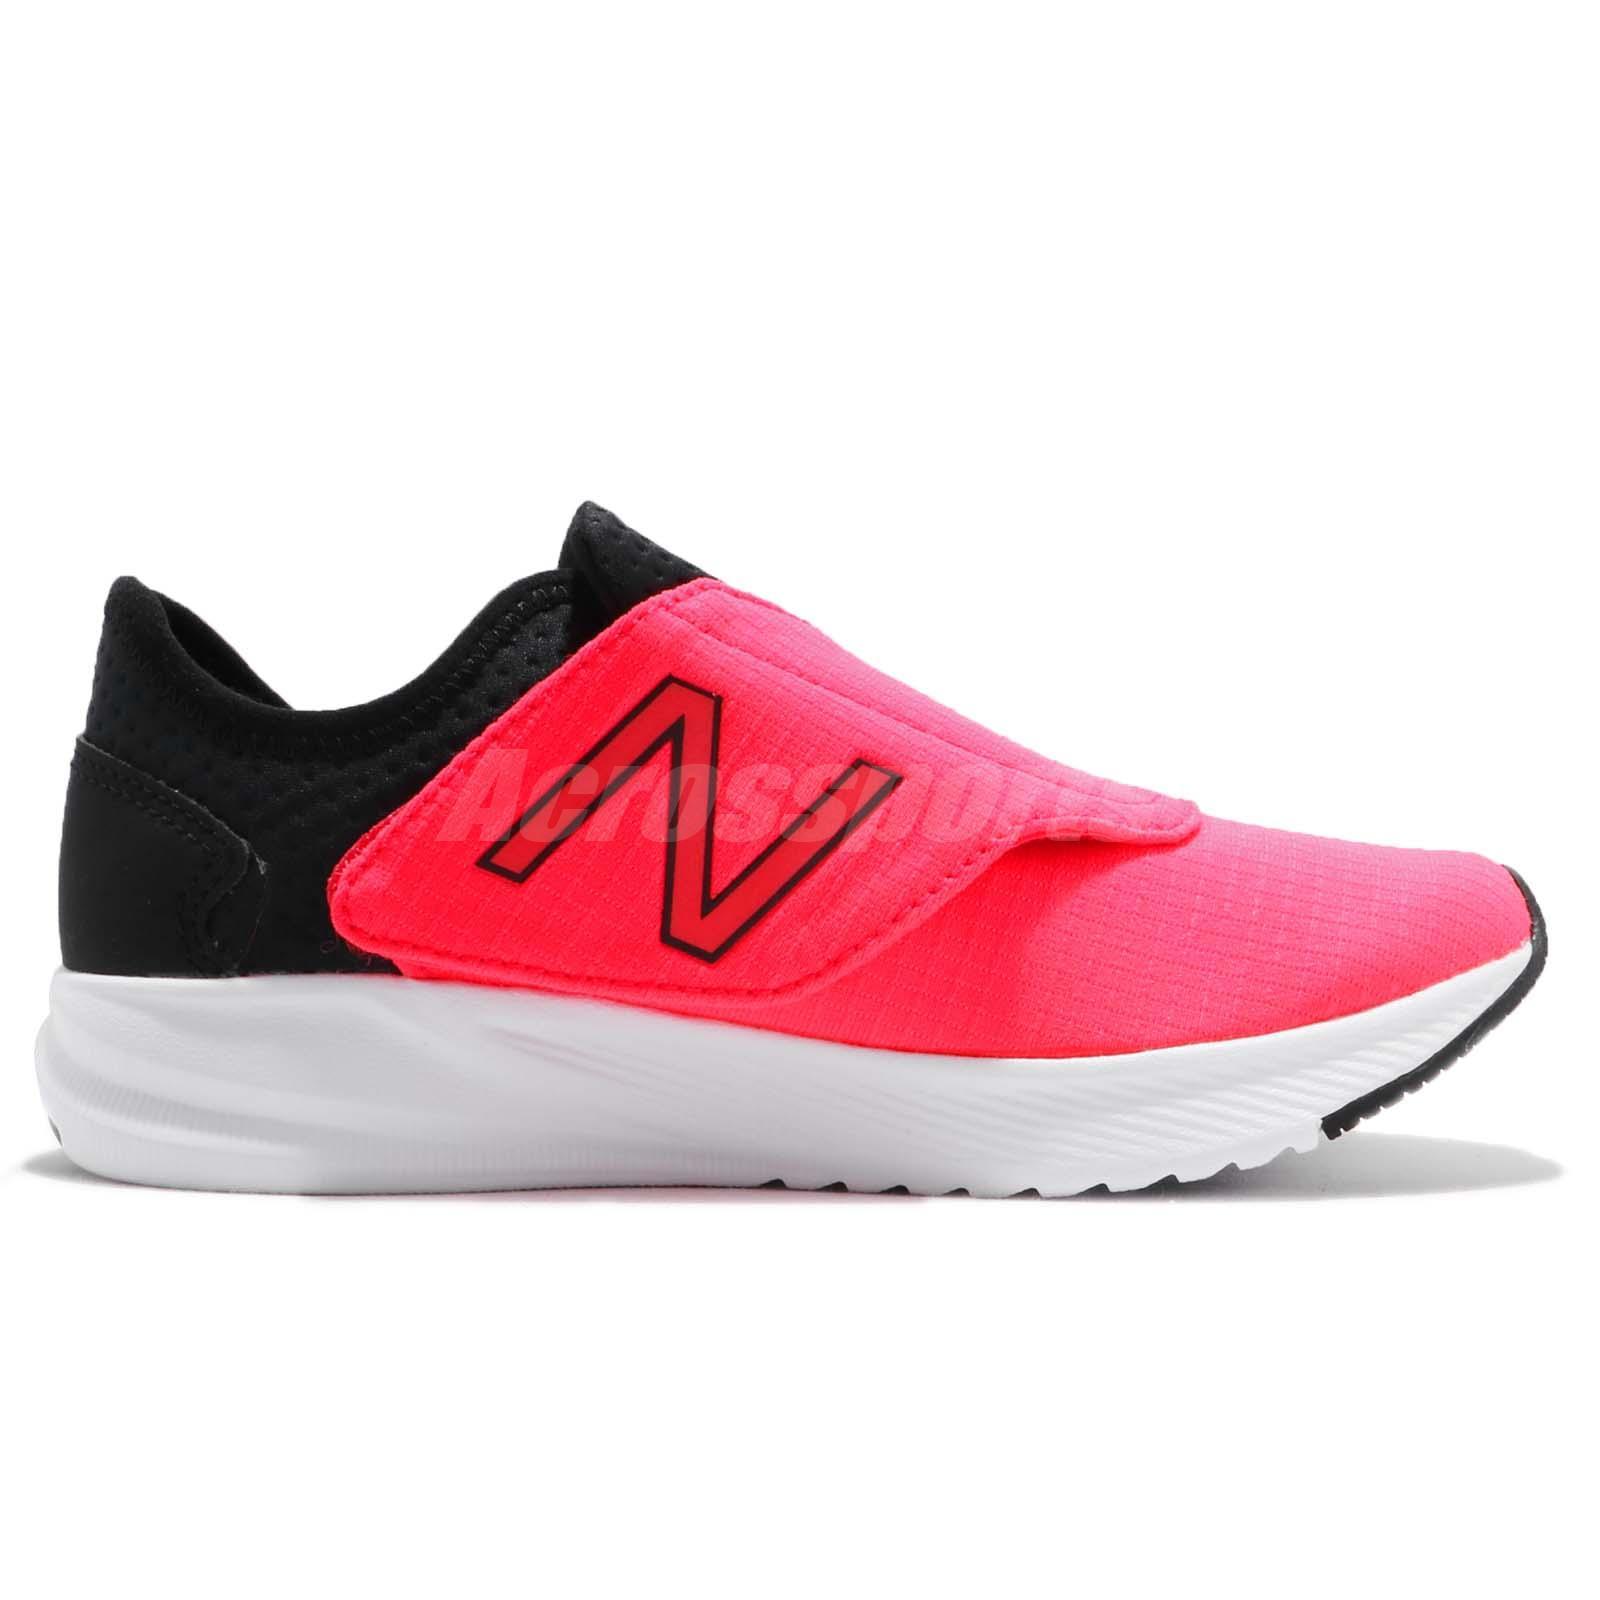 5adfa57f84619 New Balance KVFL5WPP W Wide Pink Black White Kid Preschool Shoes ...